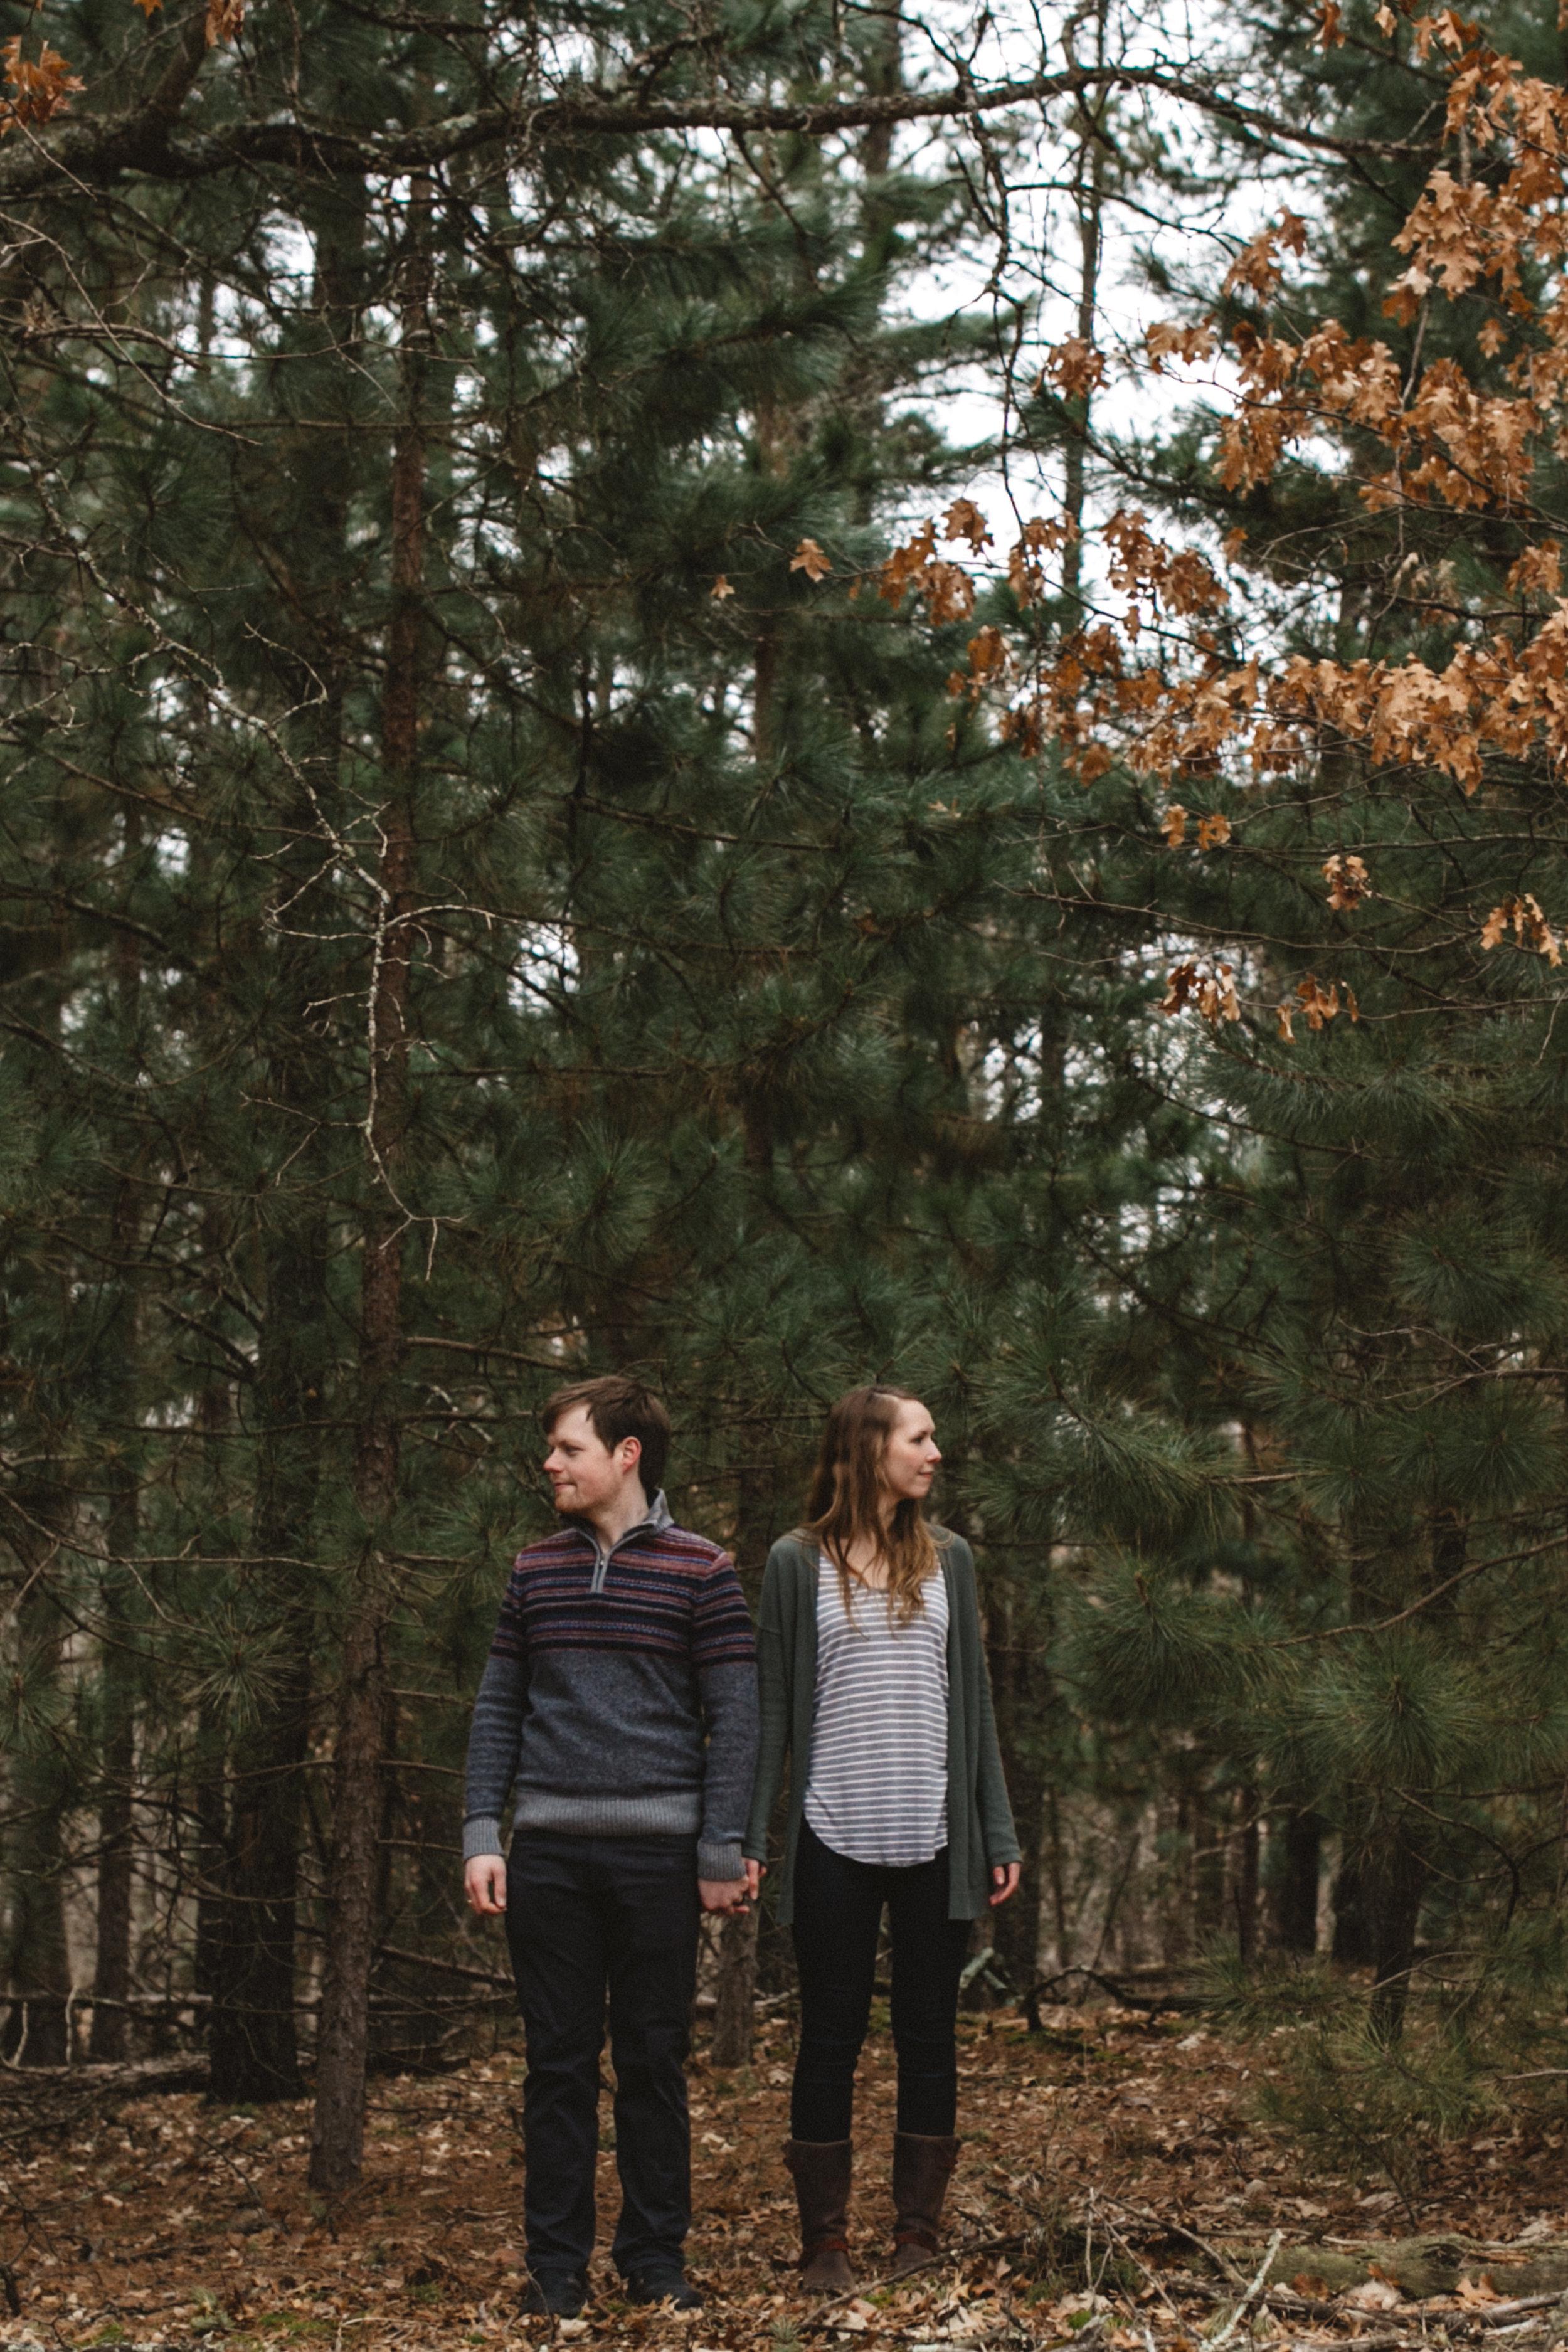 Northland Arboretum engagement session by Britt DeZeeuw photography, fine art wedding and engagement photographer in Brainerd Minnesota